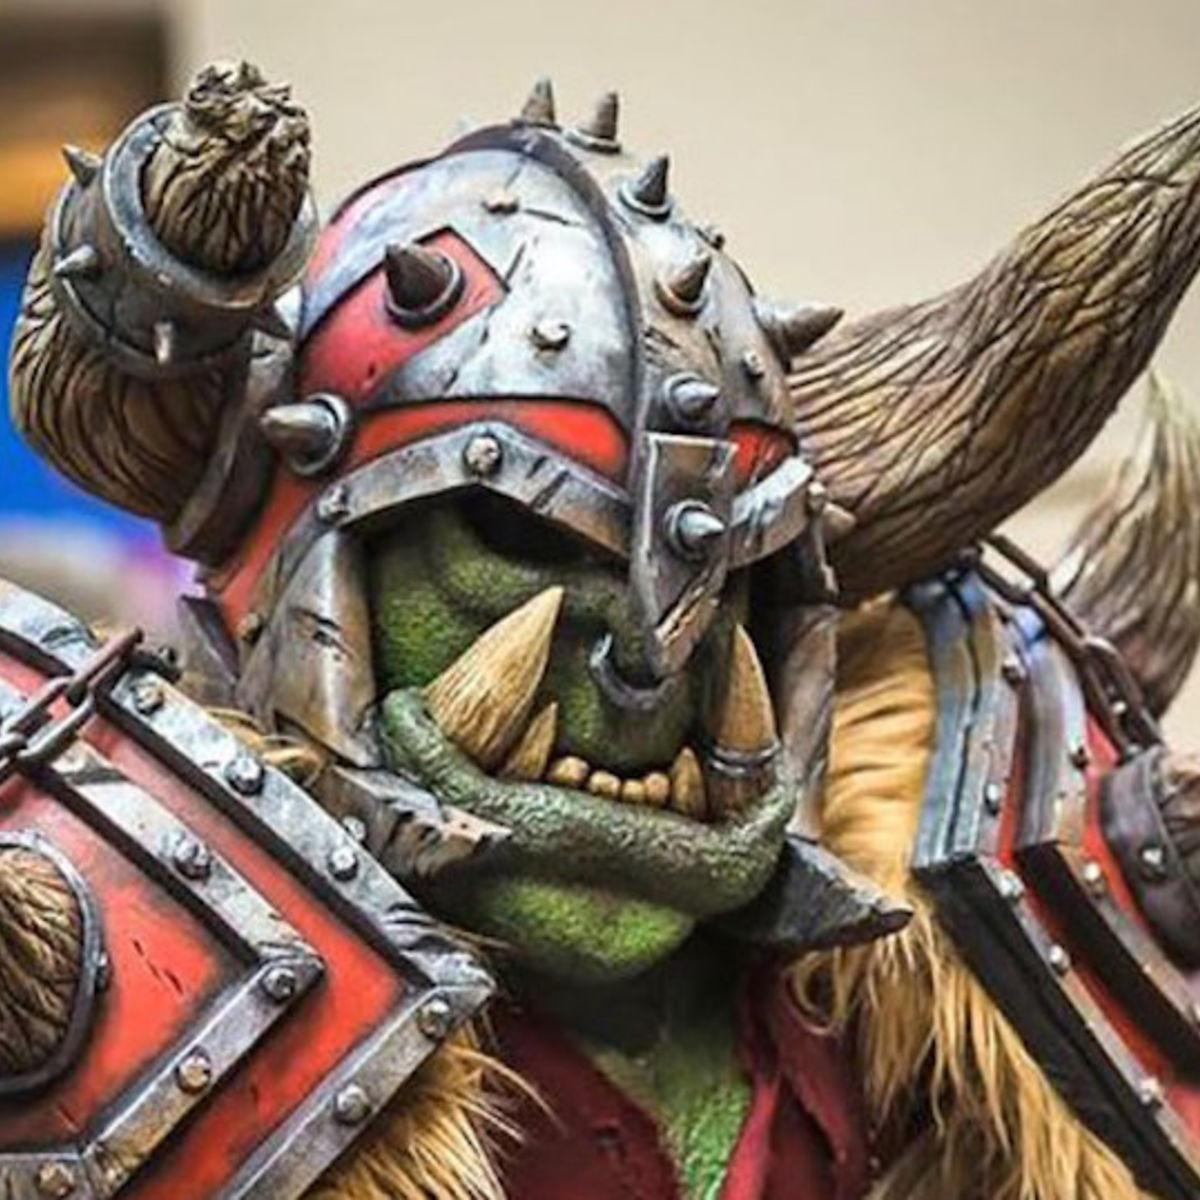 shockingly-cool-world-of-warcraft-orc-cosplay-loktar-ogar1-1.jpg